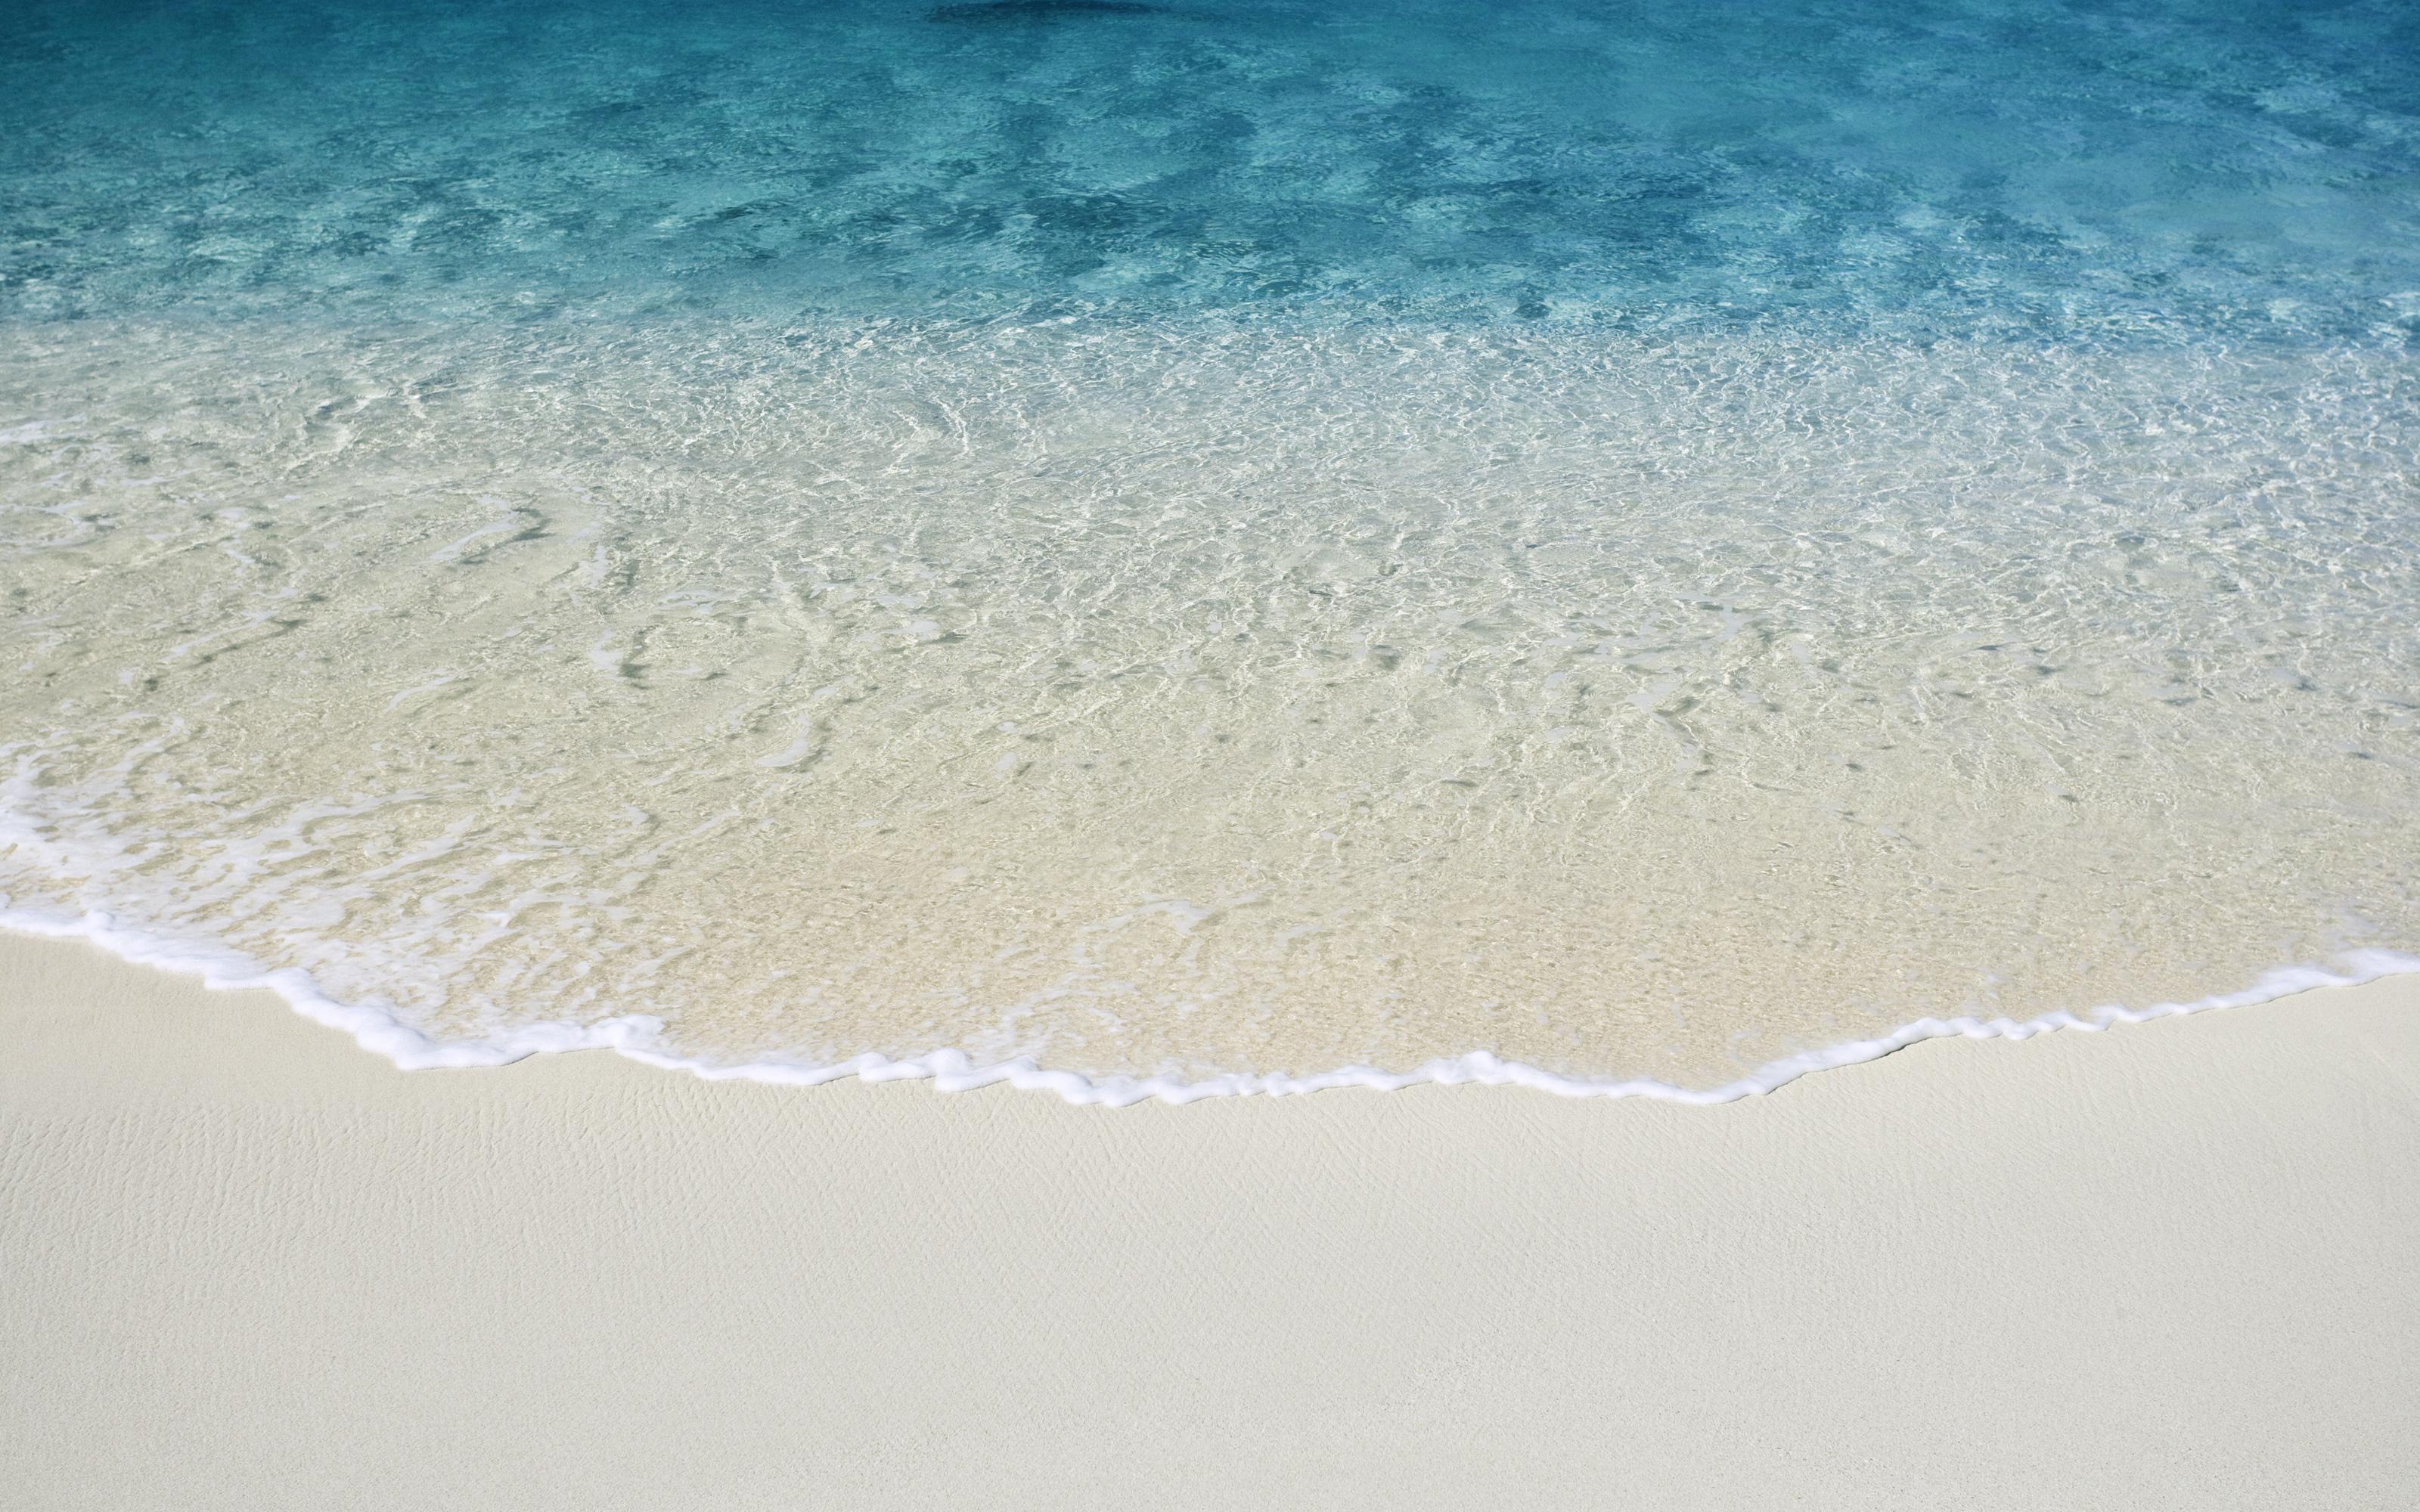 Beach Hd Wallpaper Background Image 3200x2000 Id 399945